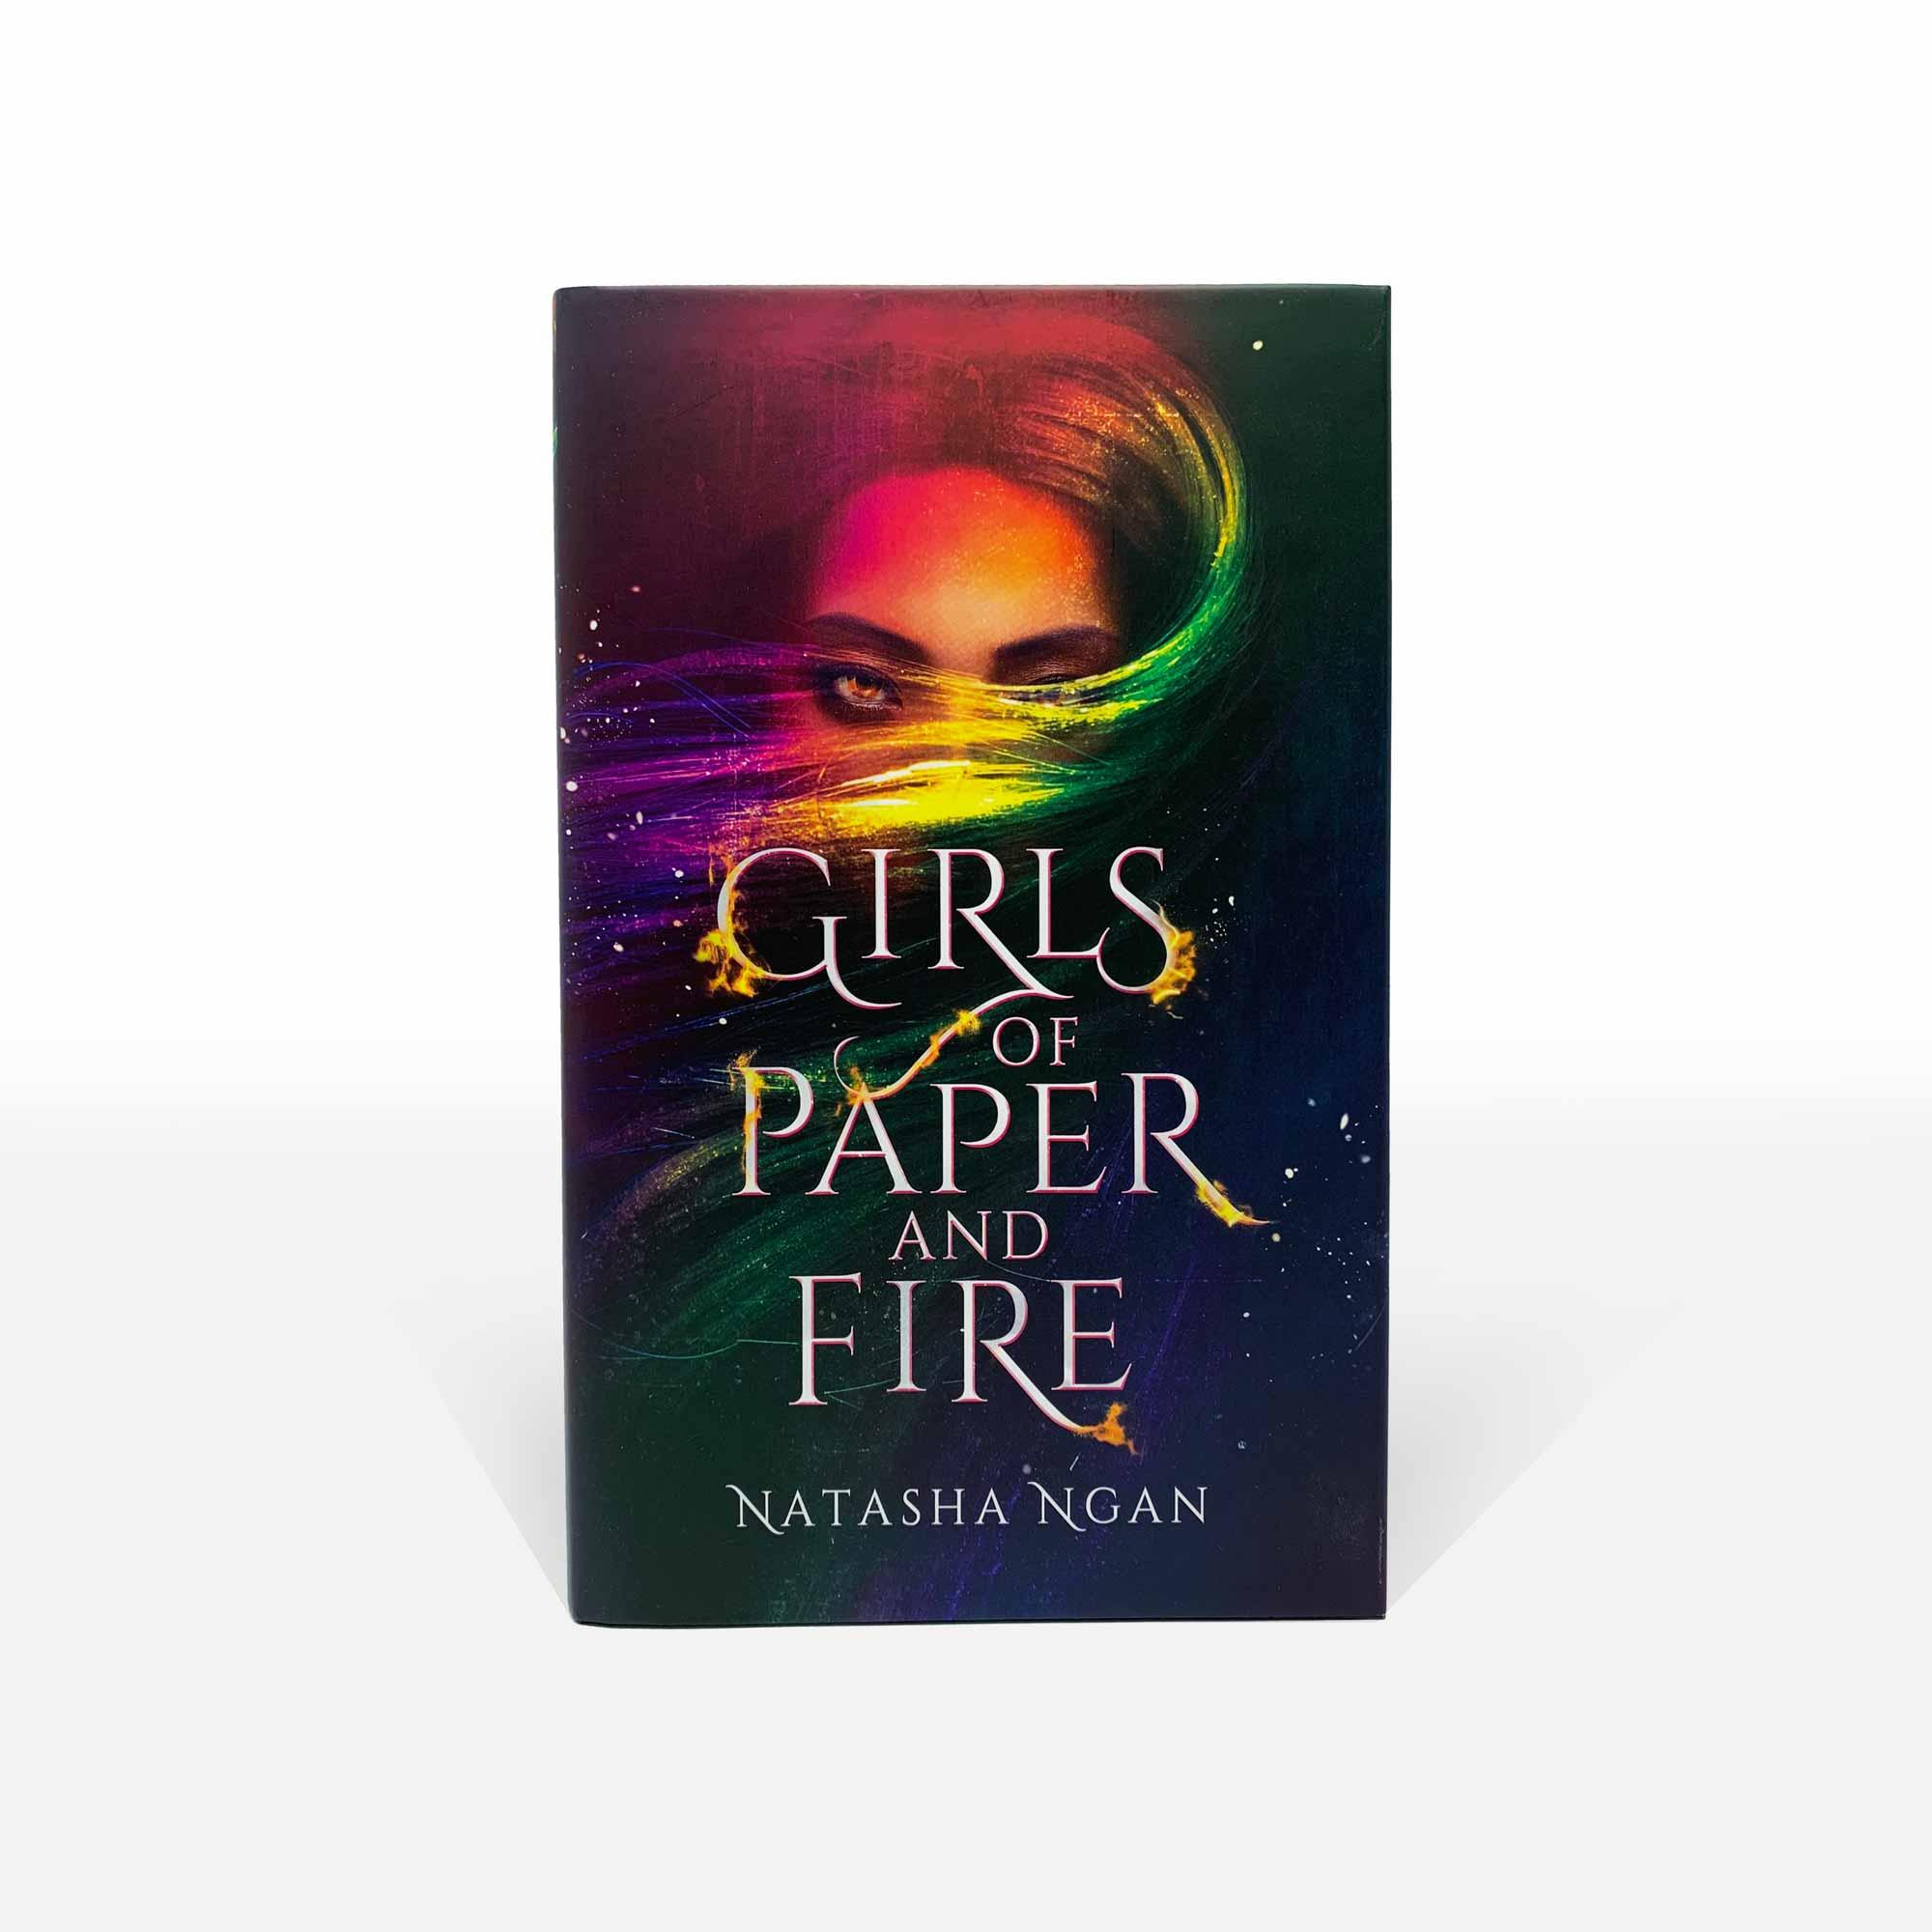 Natasha Ngan - Girls of Paper and Fire